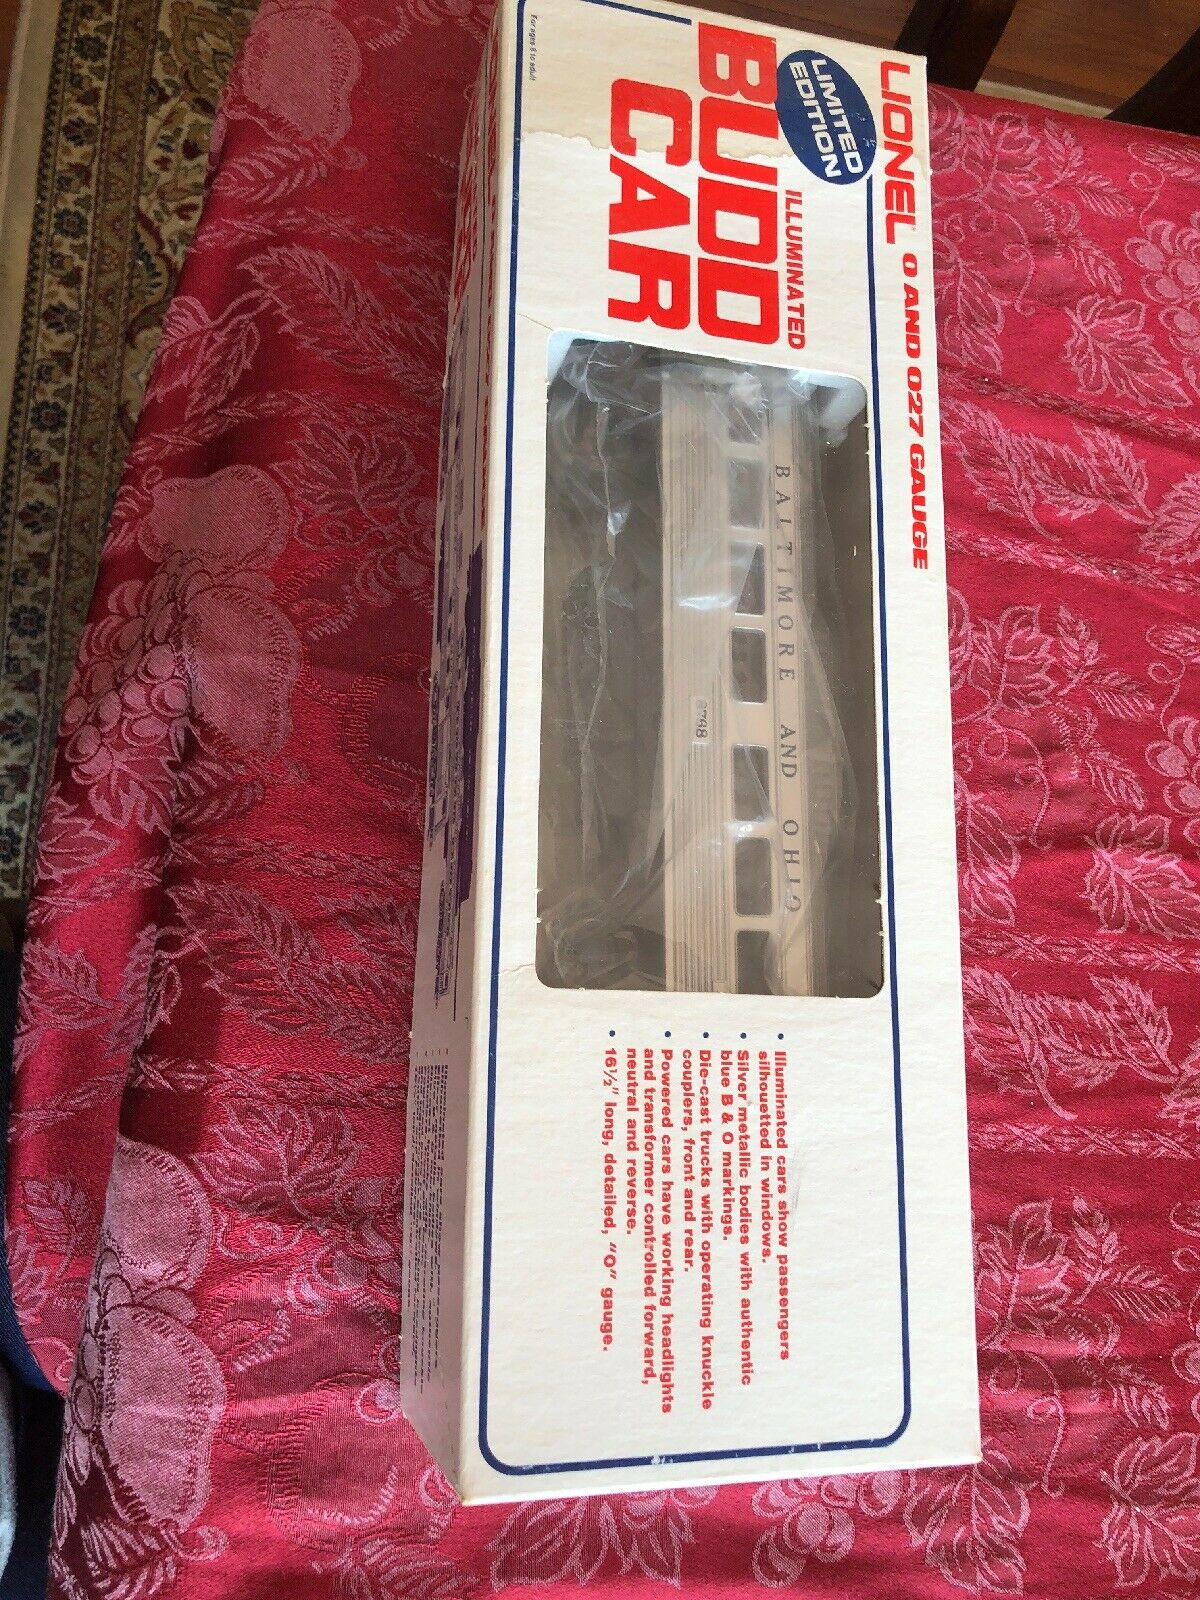 Lionel 8768 Illuminated Budd RDC -1 Commuter Train Passenger Car New